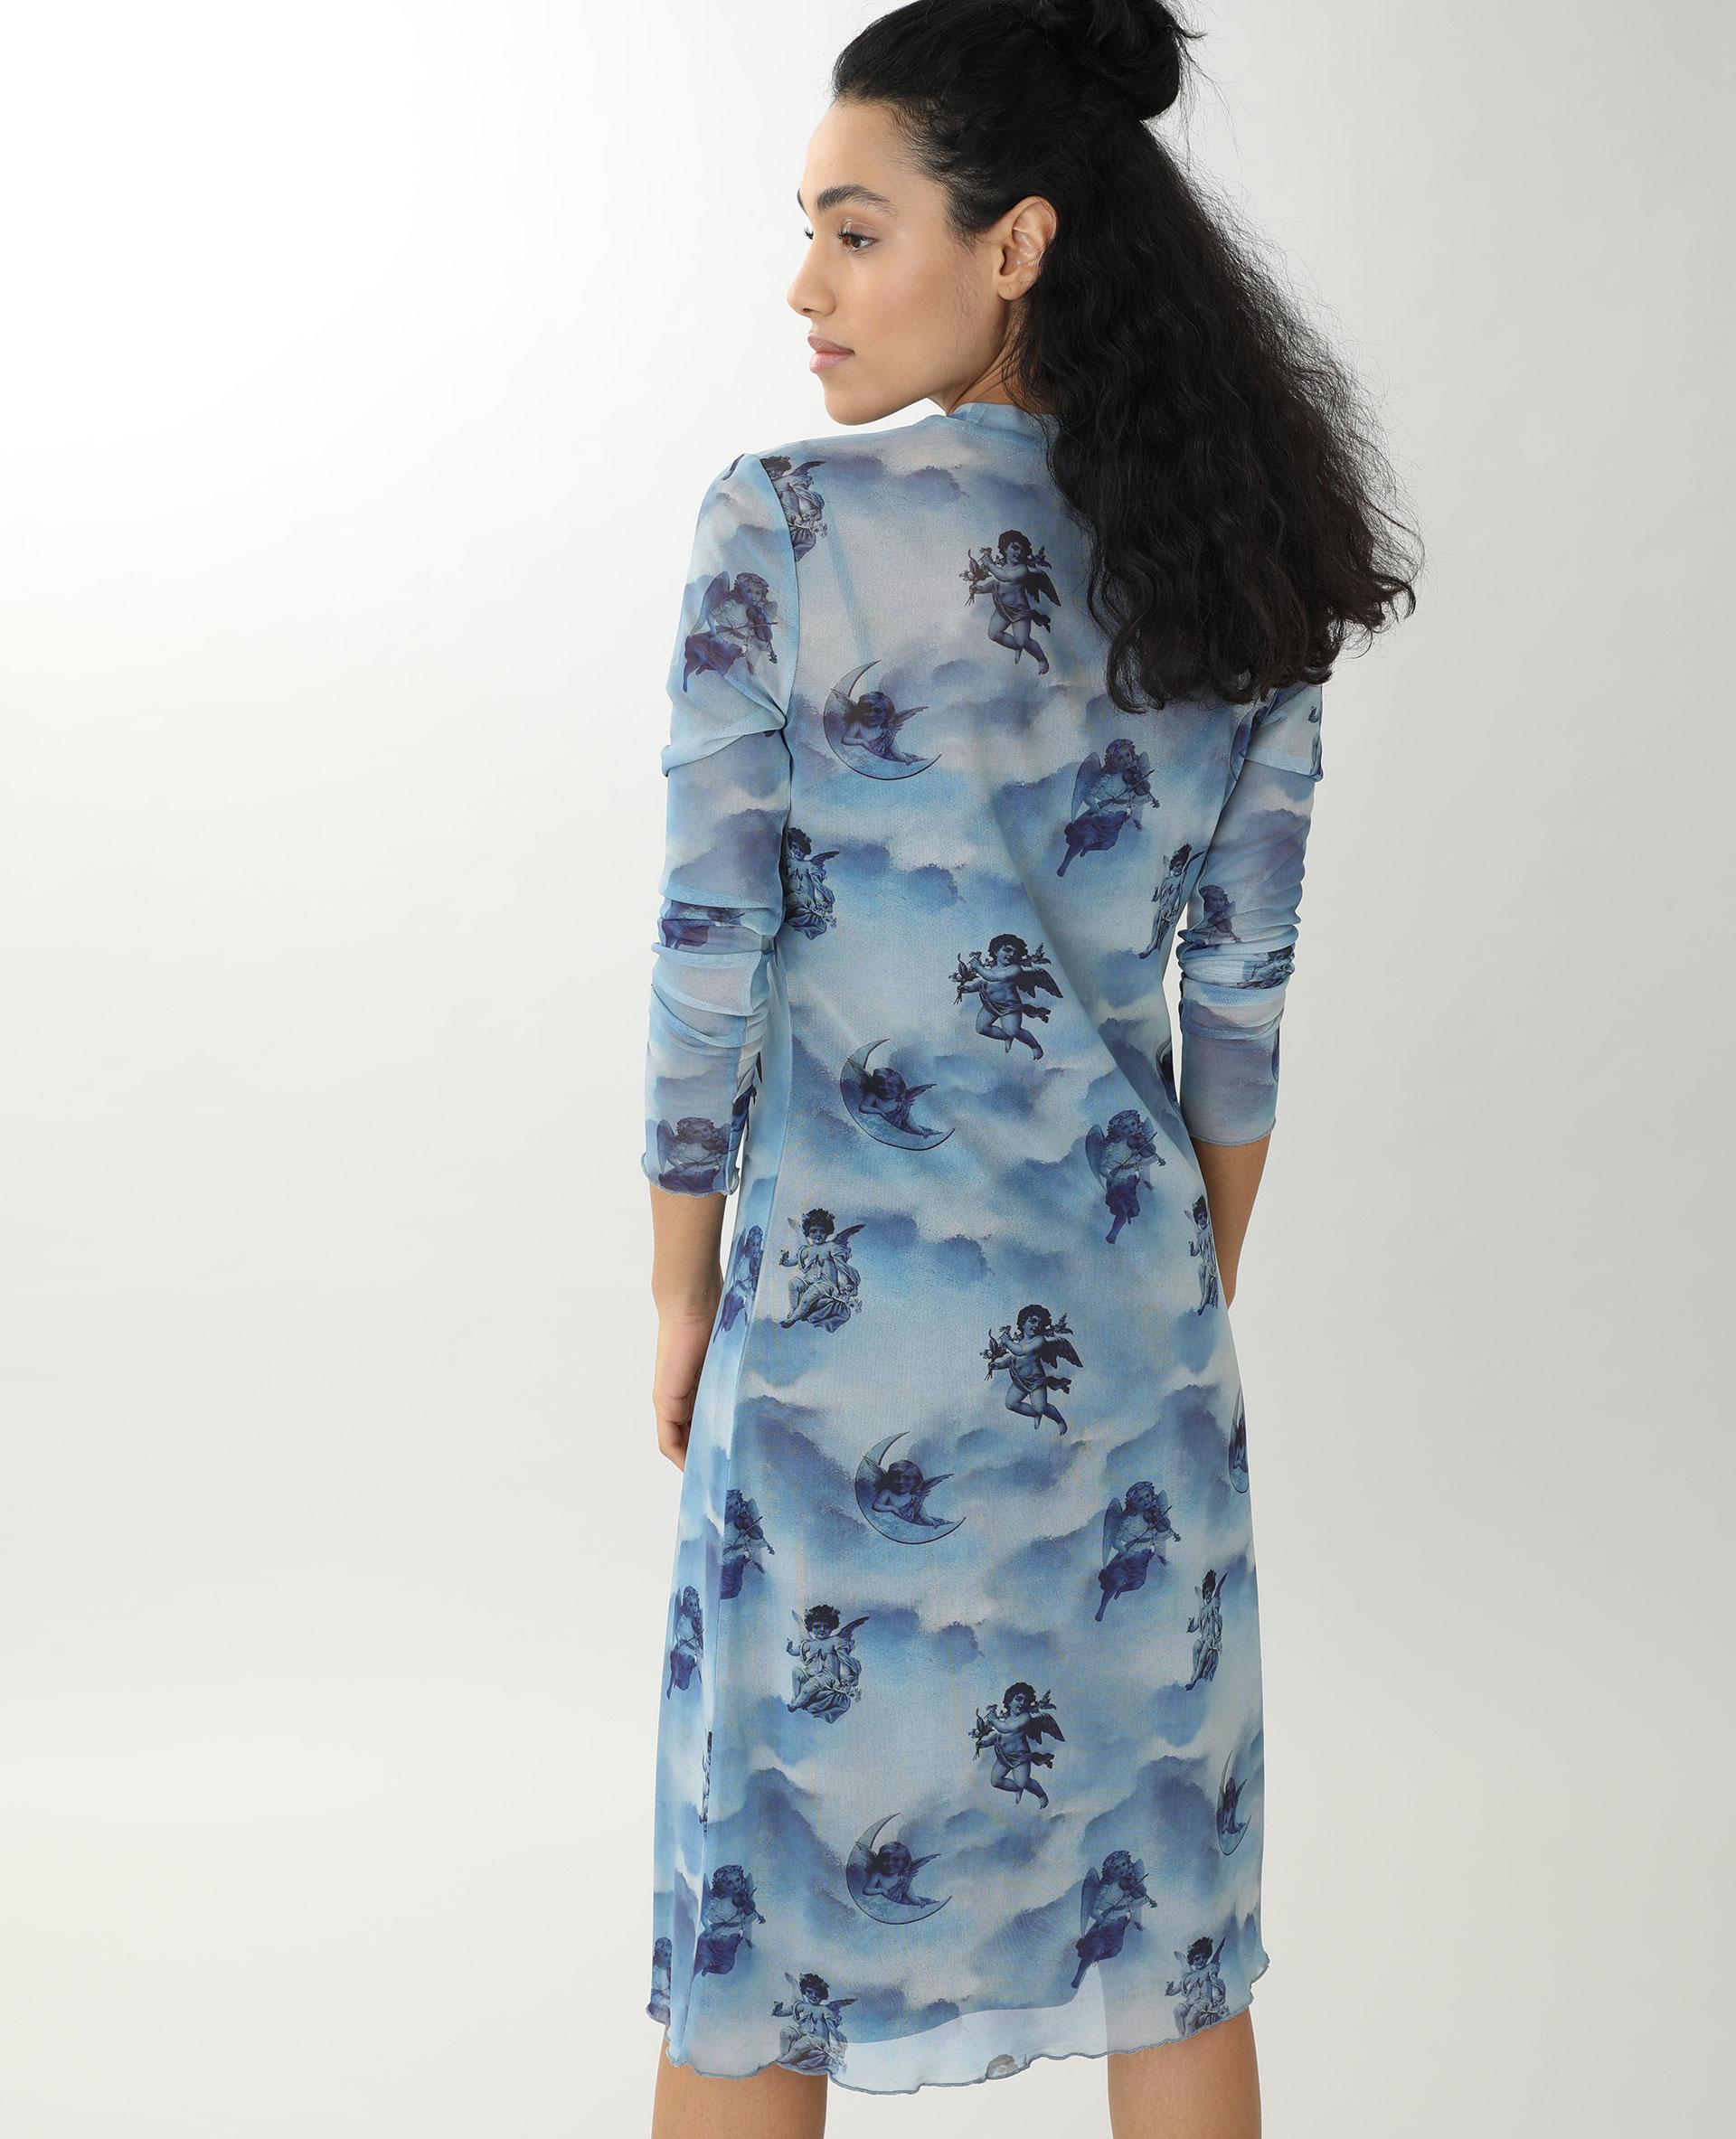 Robe transparente bleu - Pimkie